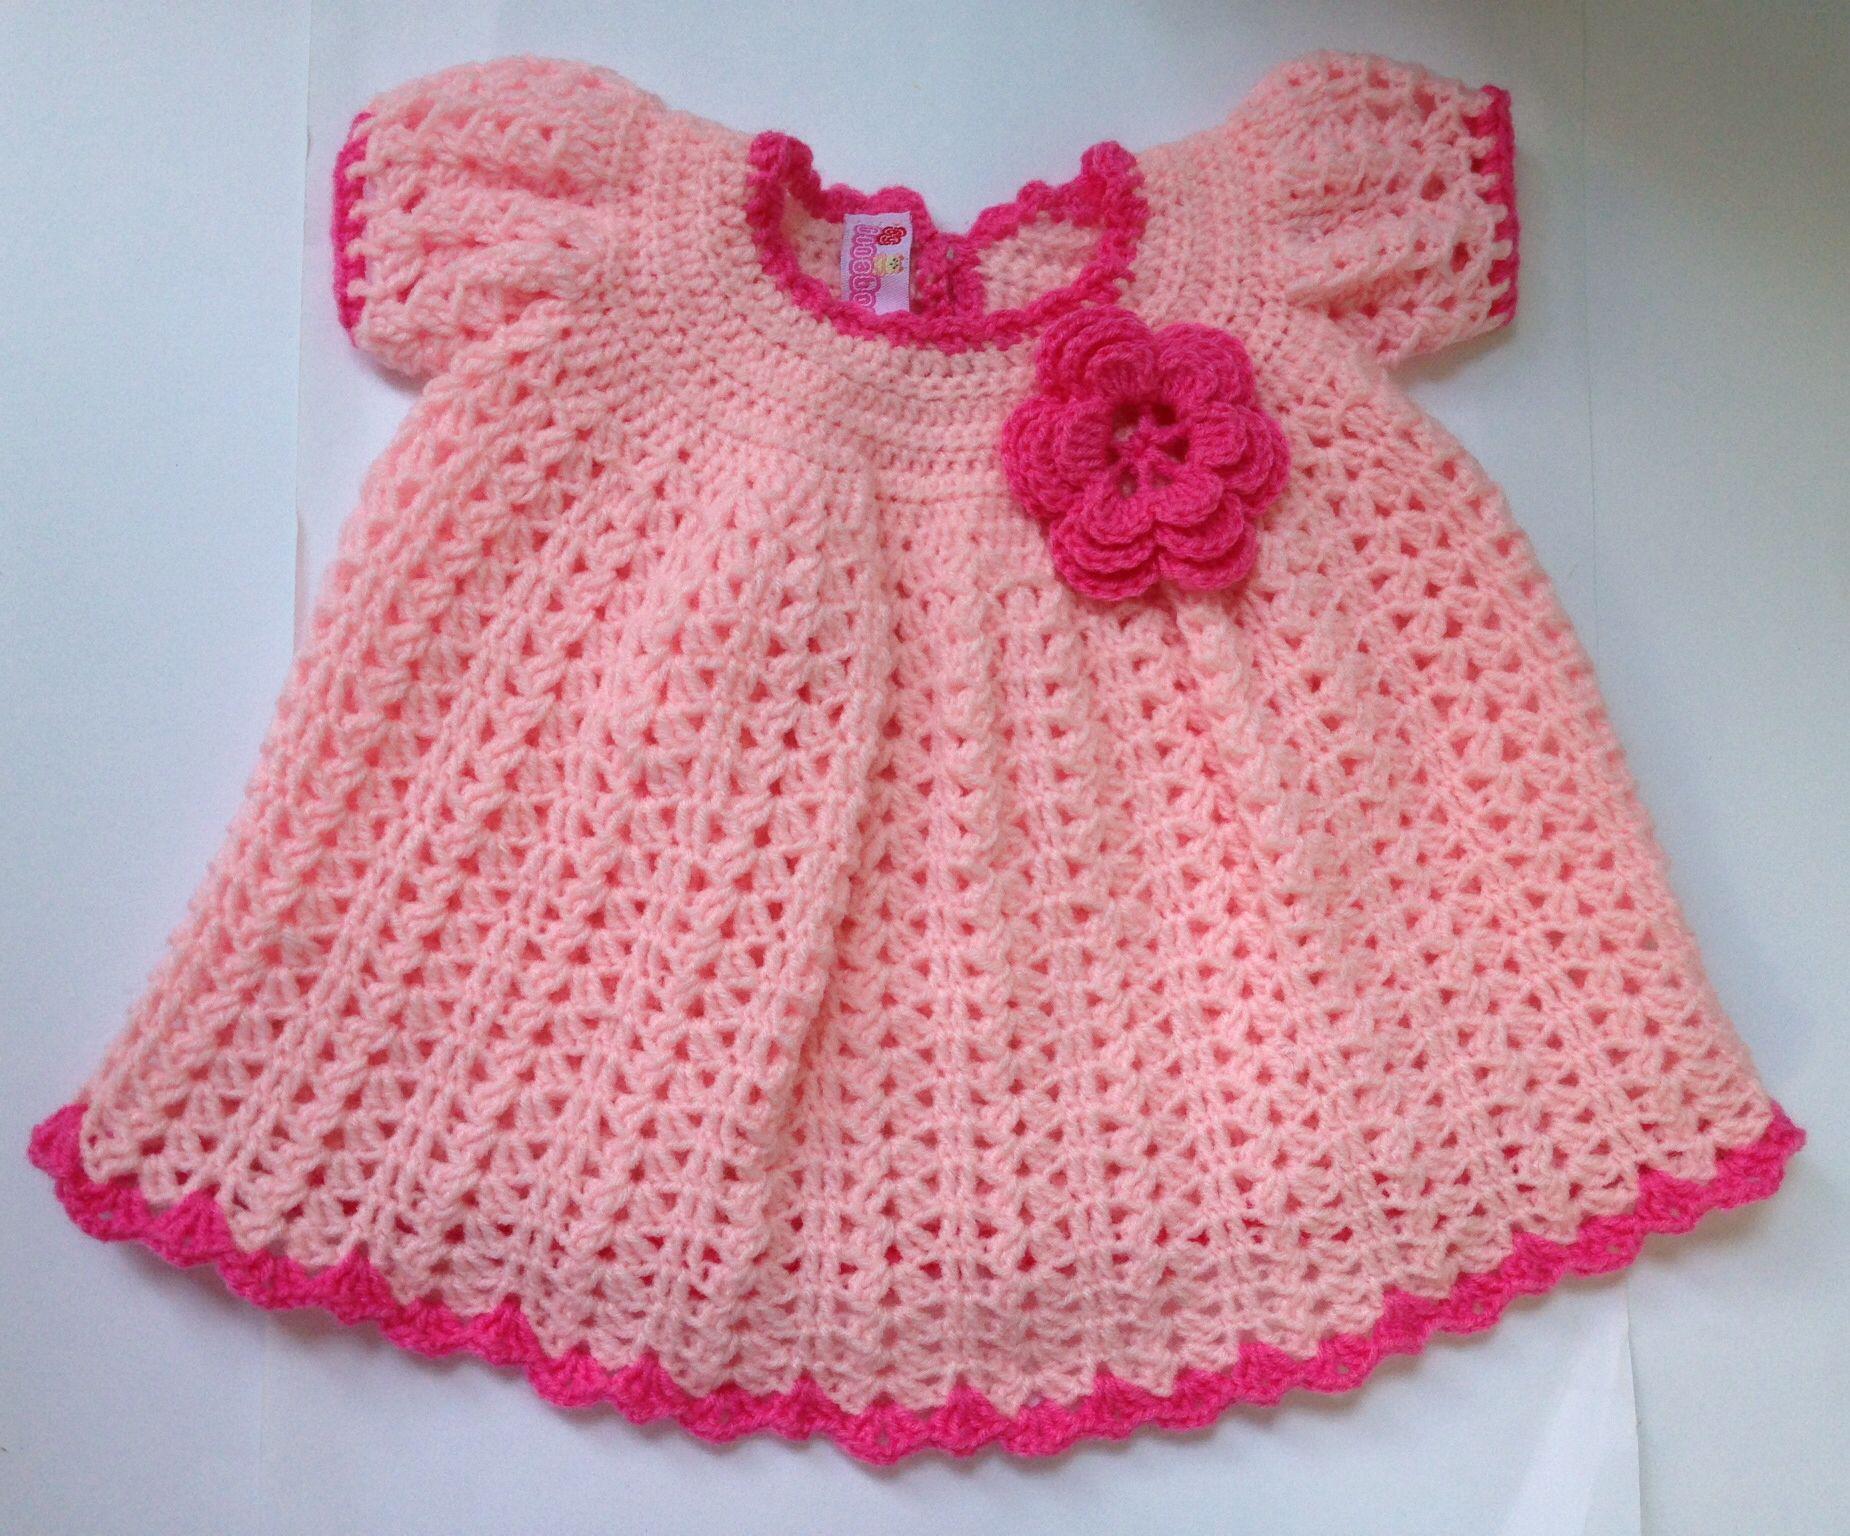 Crochet baby pink dress | crochet | Pinterest | Suéteres para bebé ...